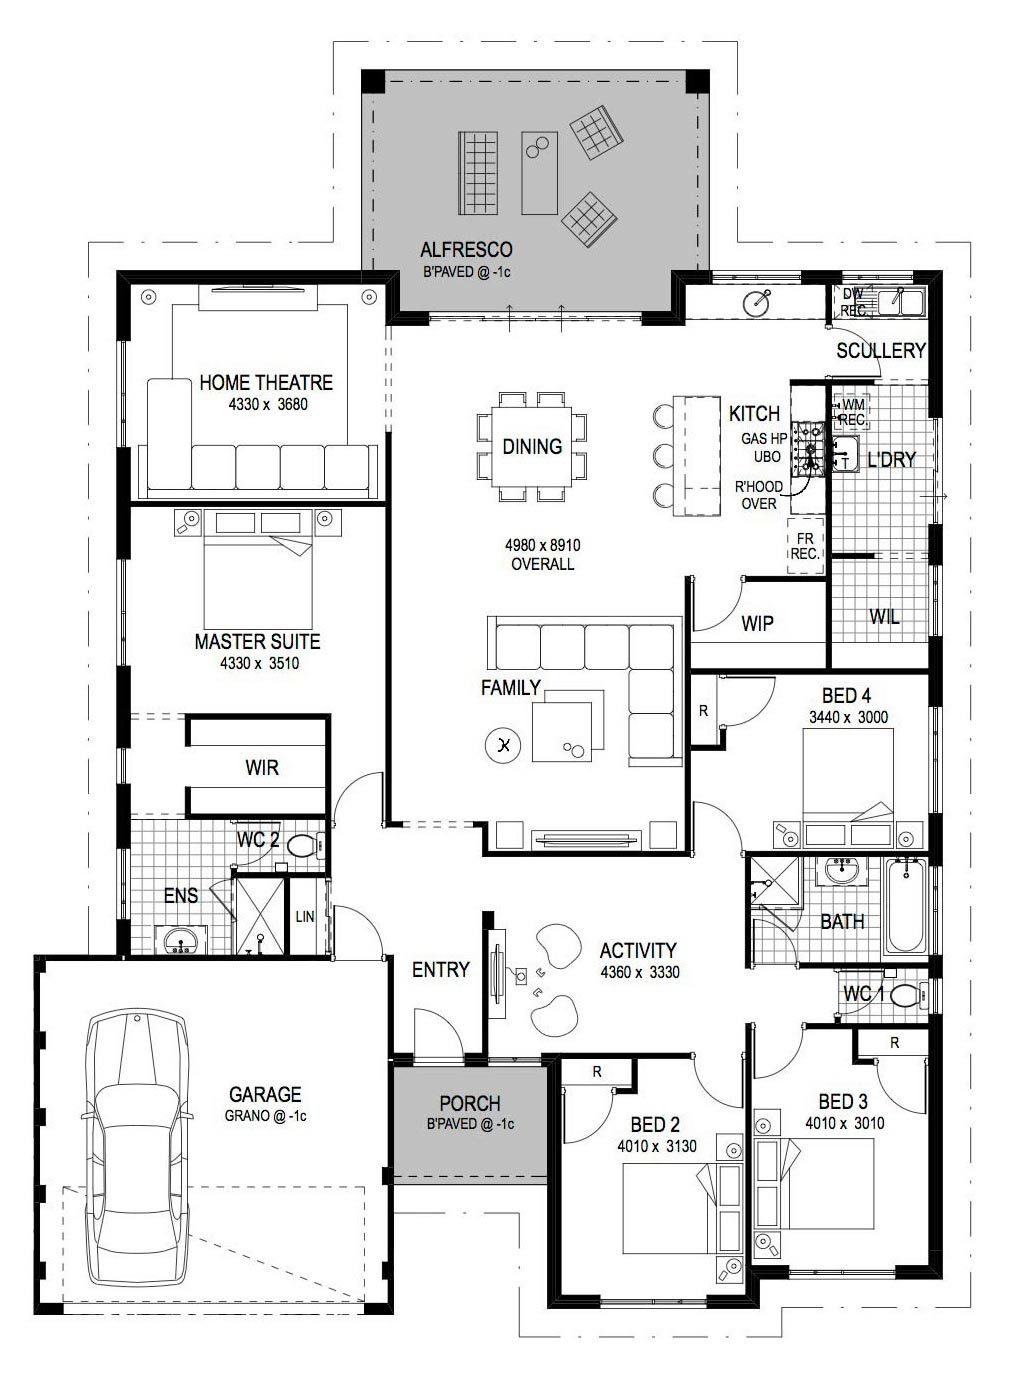 Cheap Home Builders Perth, WA Home Designs House plans